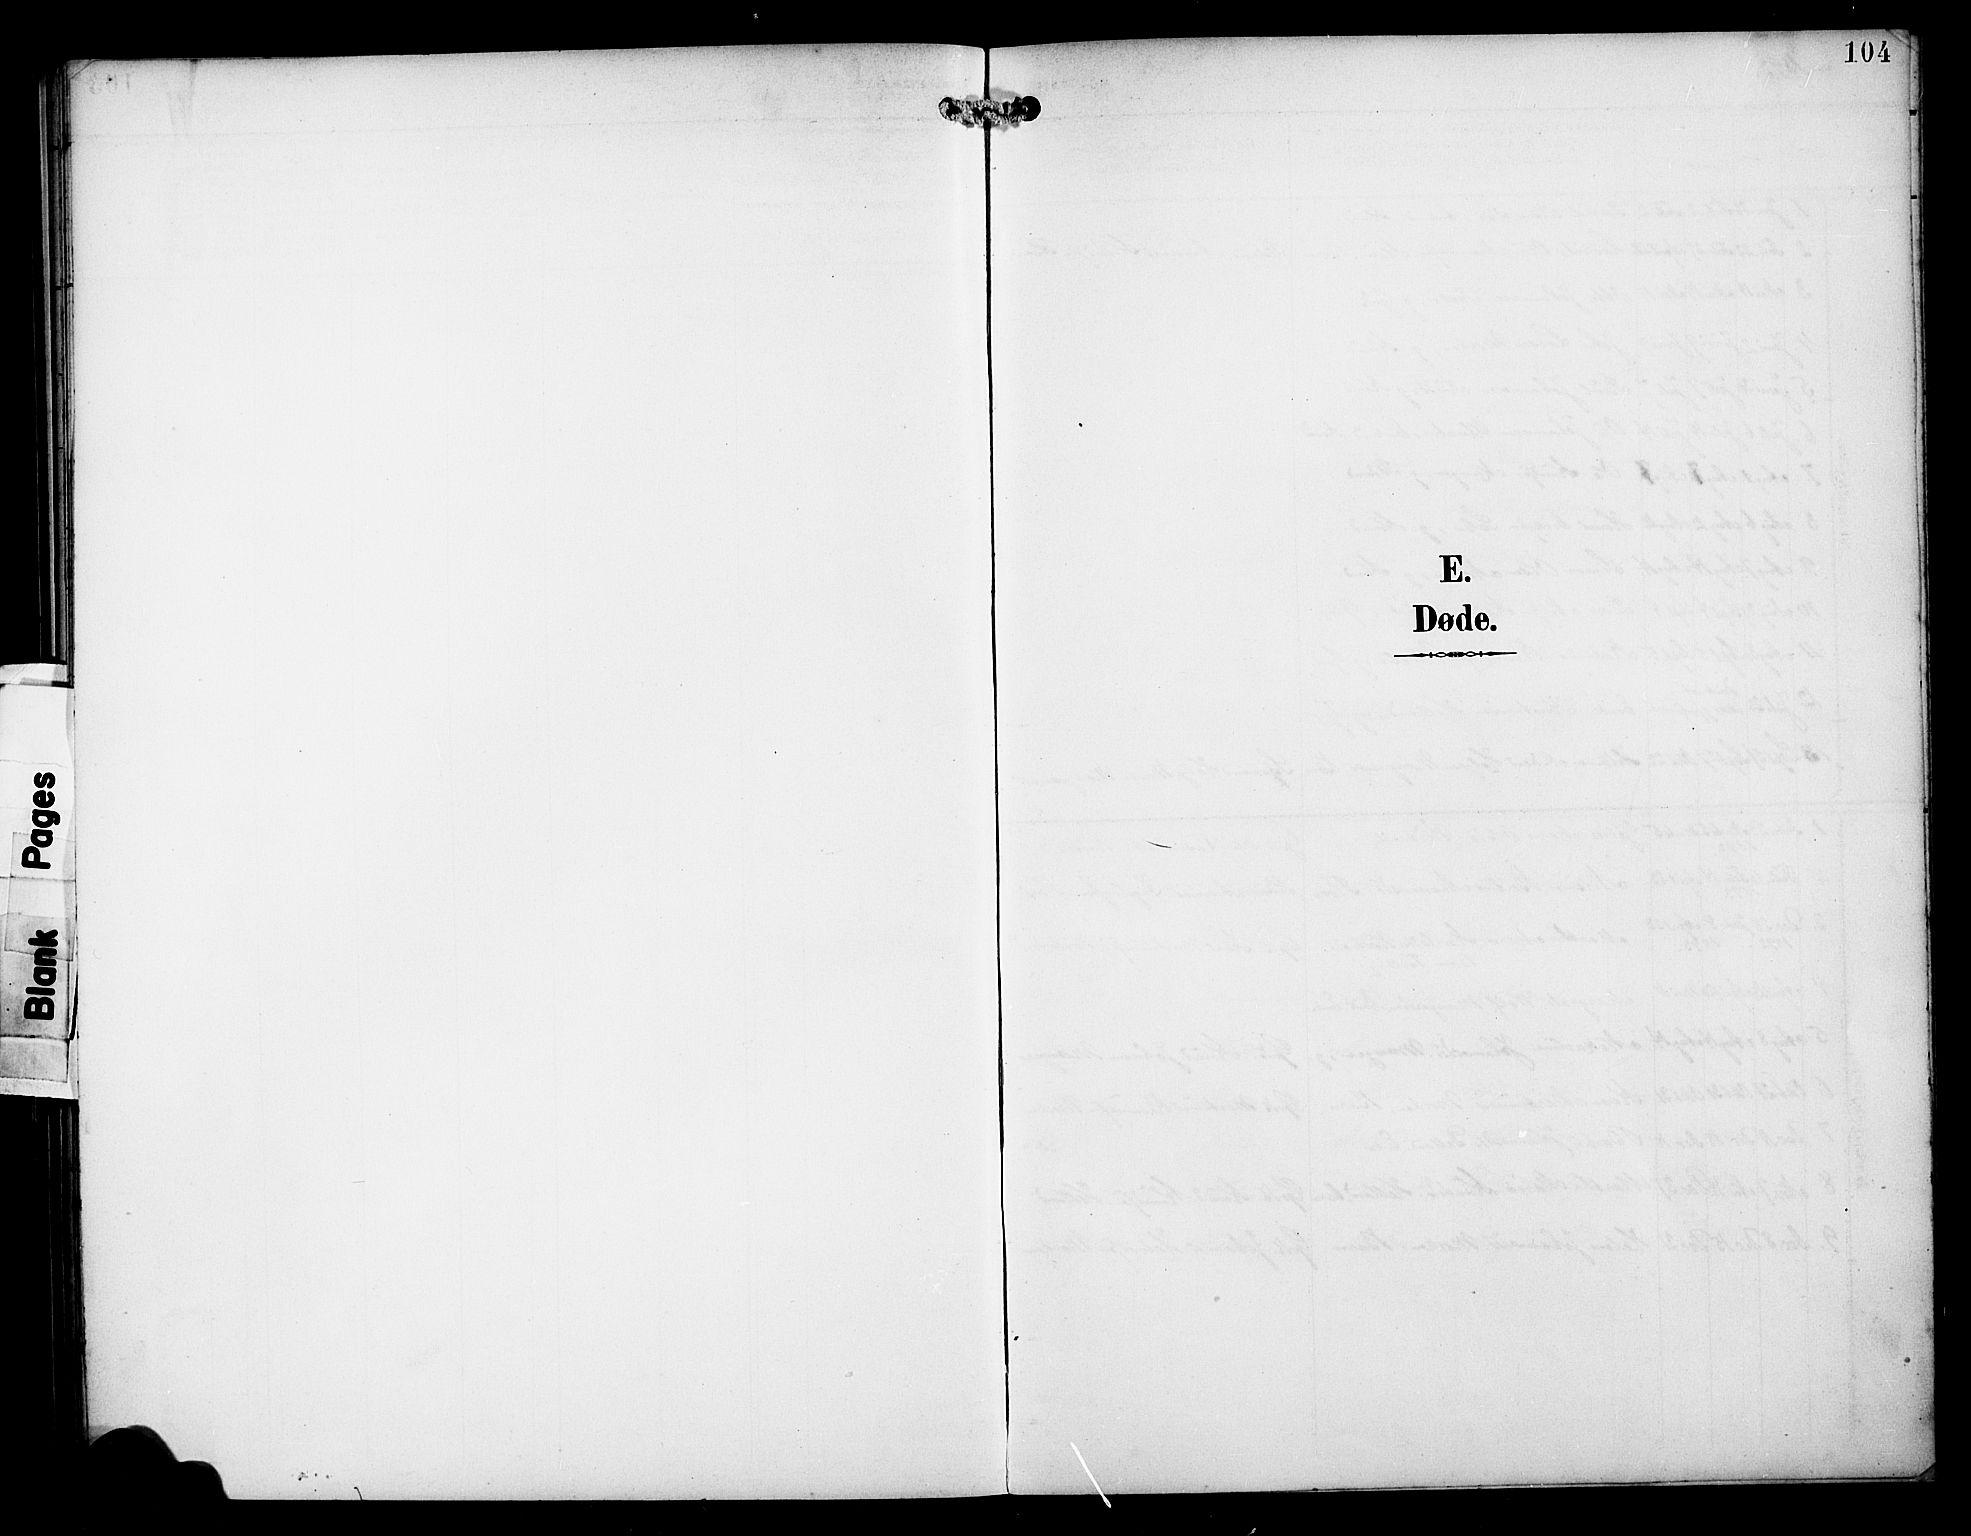 SAB, Manger sokneprestembete, H/Haa: Ministerialbok nr. B 2, 1893-1906, s. 104